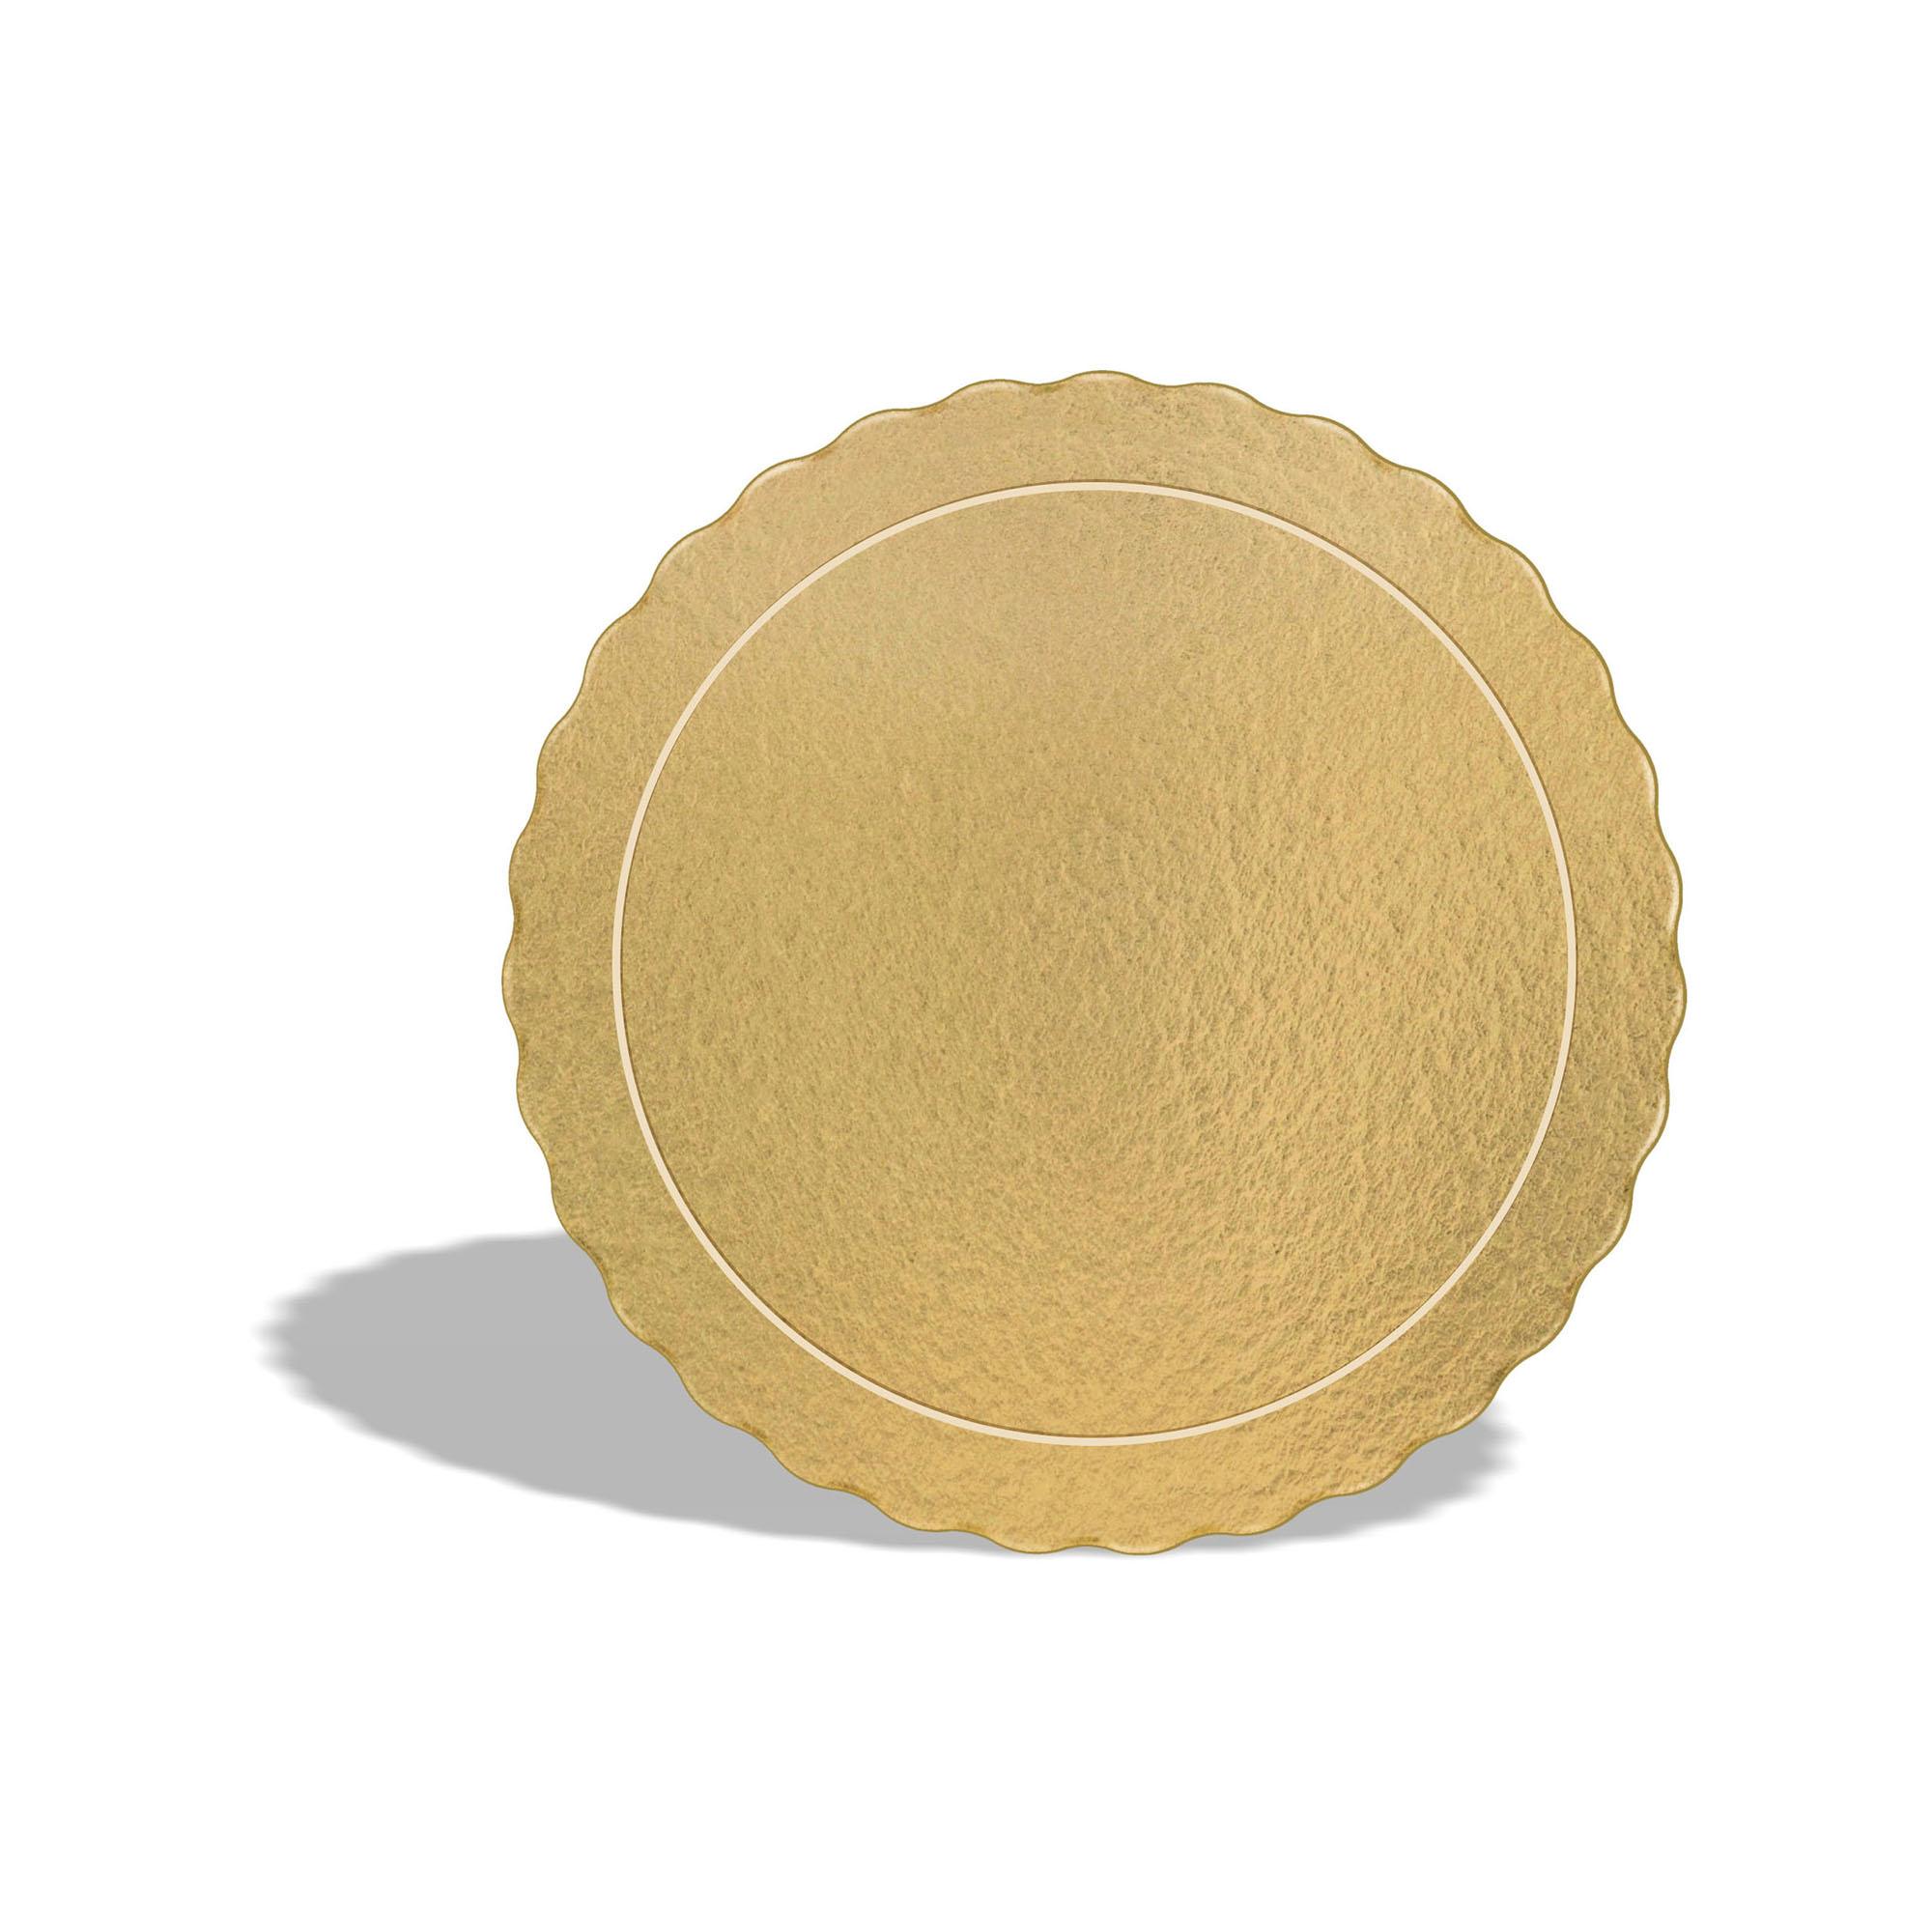 50 Bases Laminadas, Suporte P/ Bolo, Cake Board, 28cm - Ouro